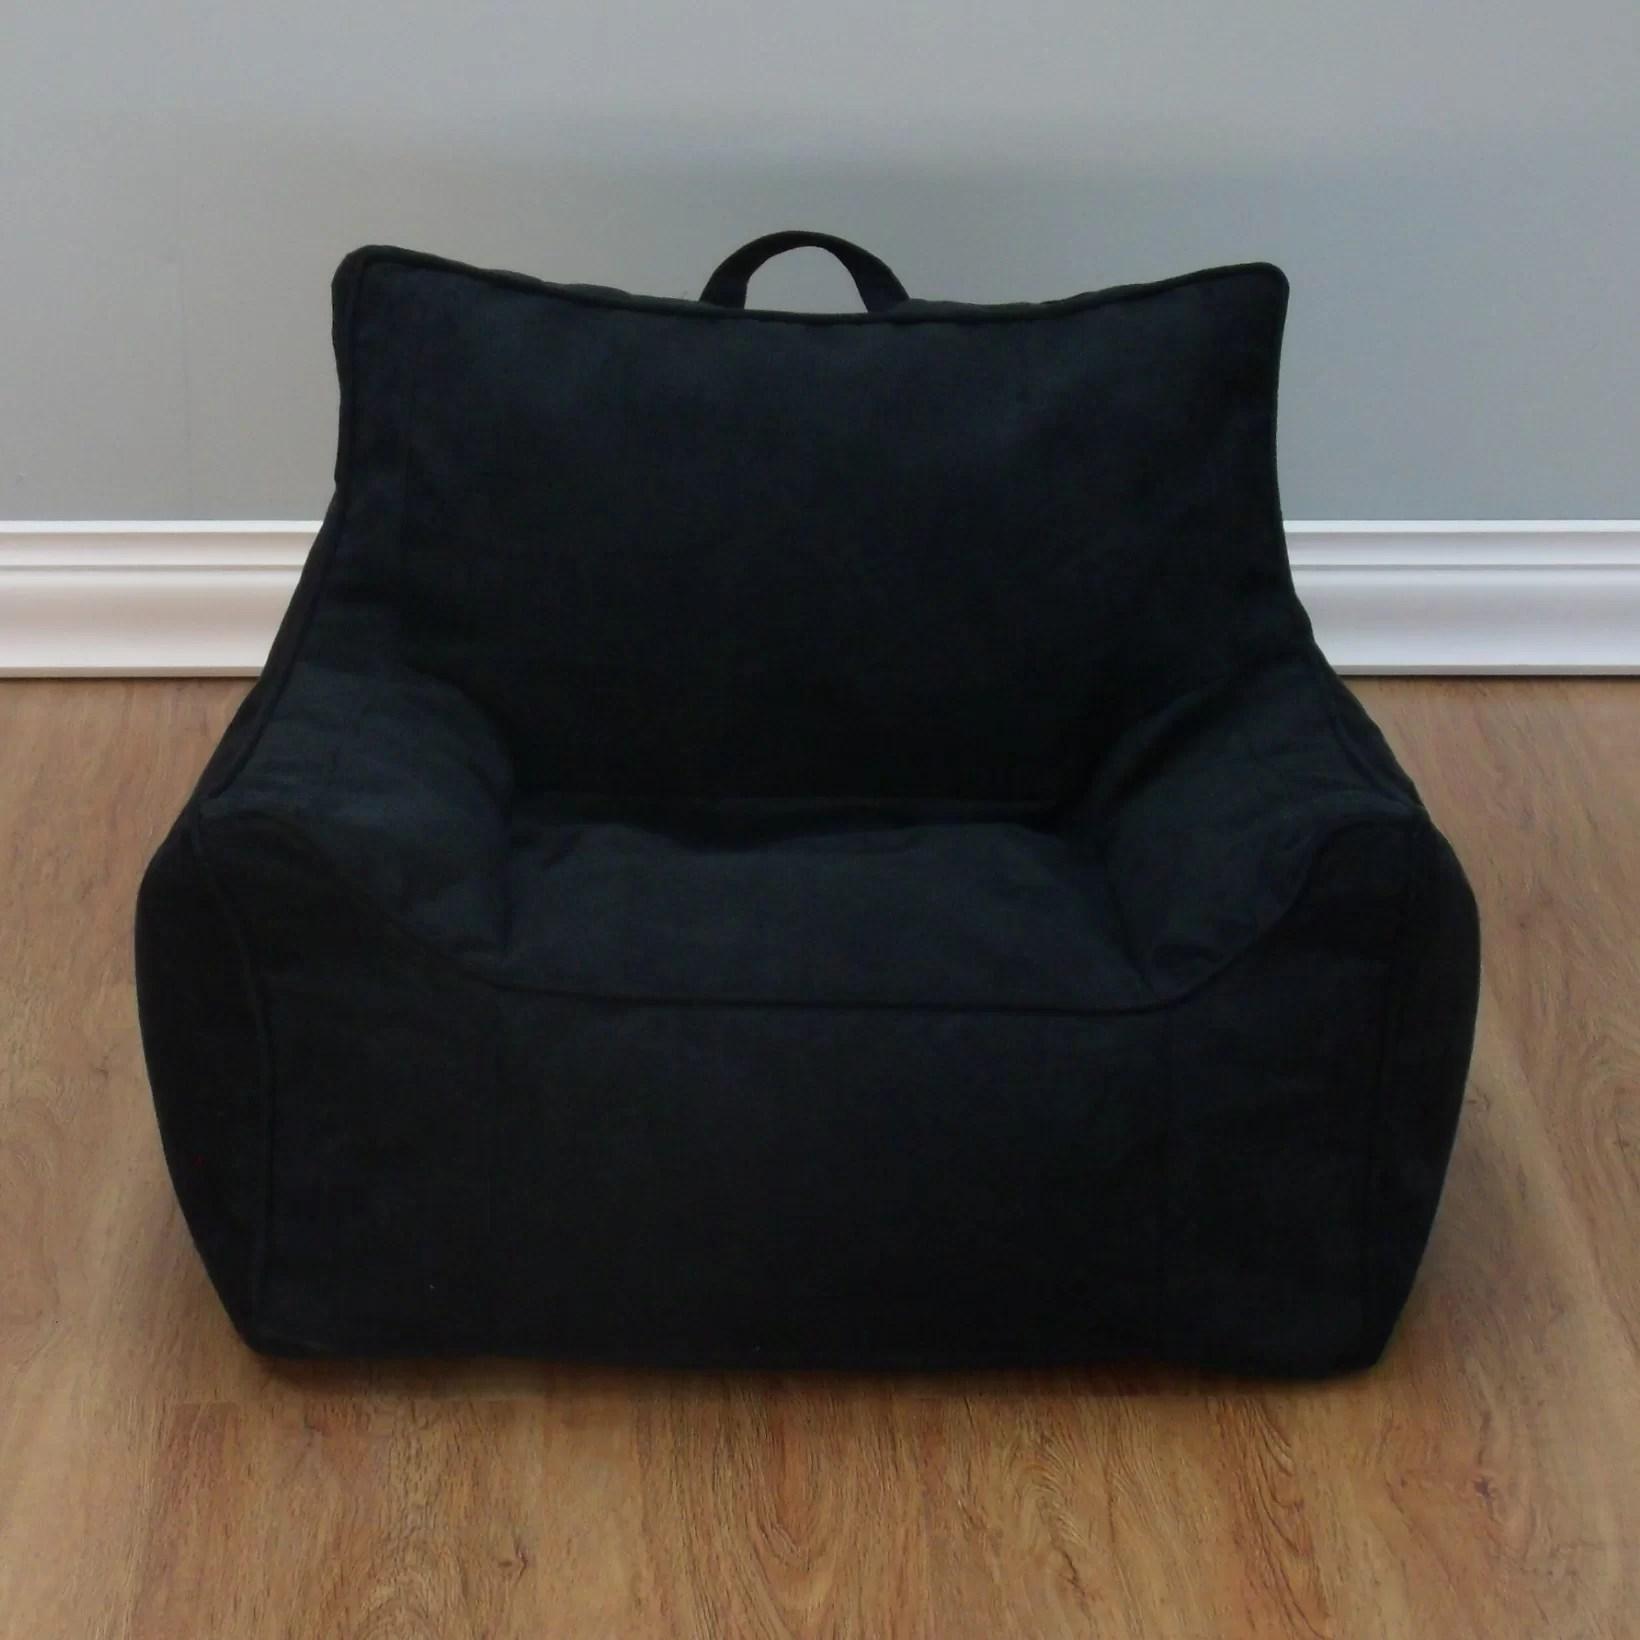 rocking bag chair chairs and ottomans x rocker bean wayfair